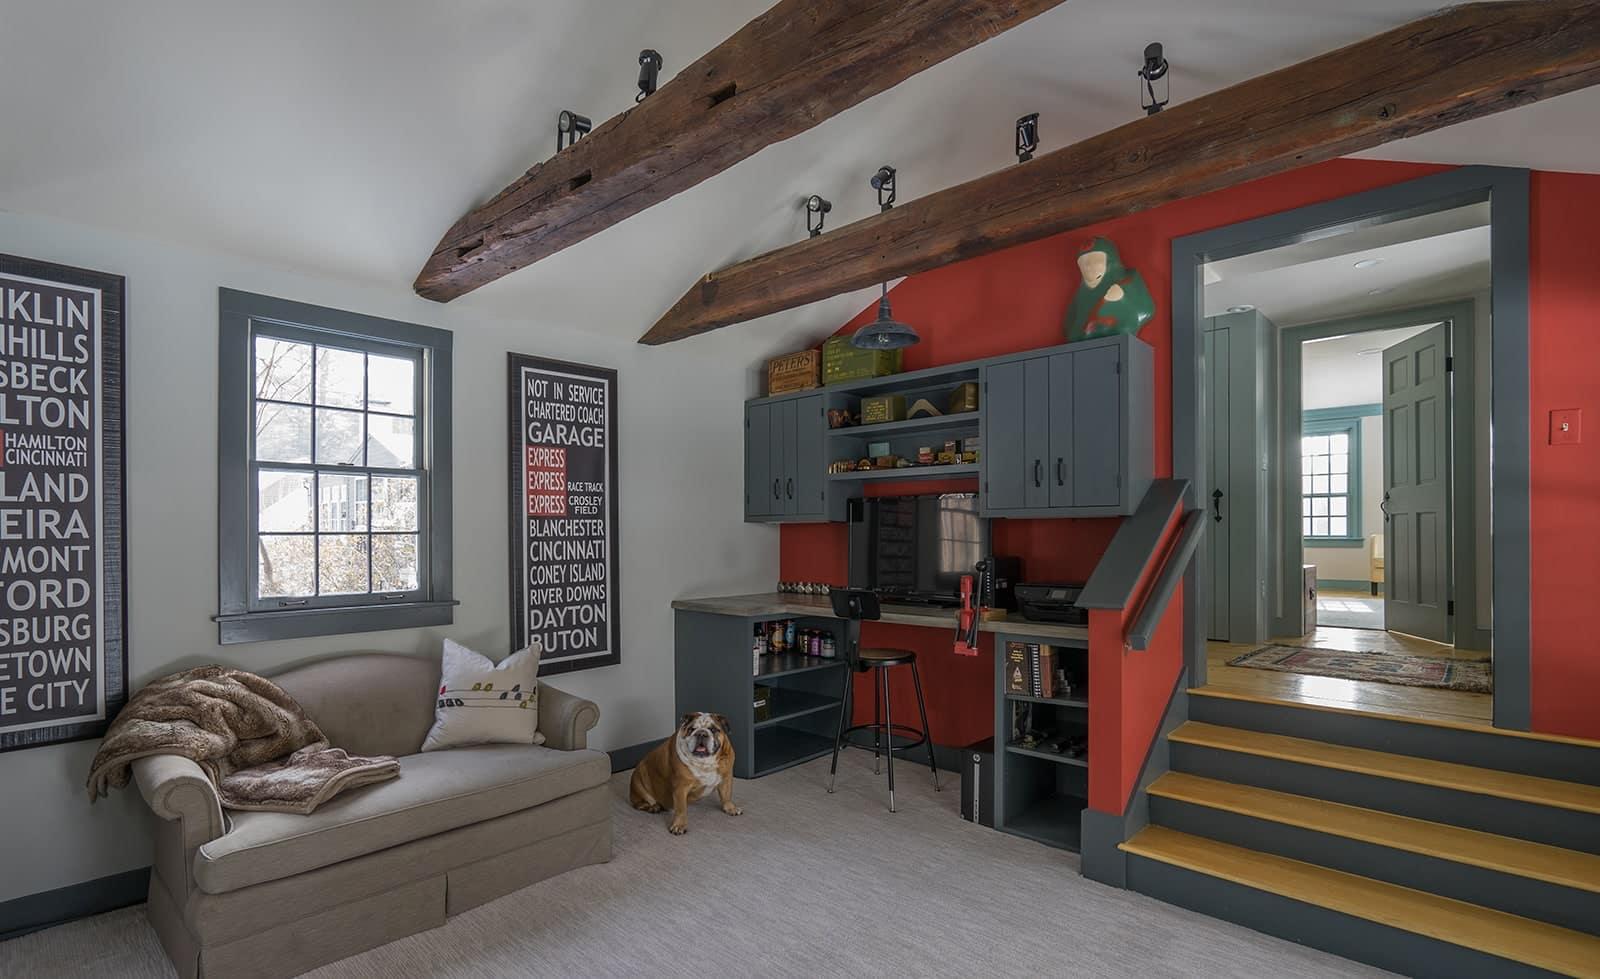 New Hampshire Homestead Historic Interior Living Room